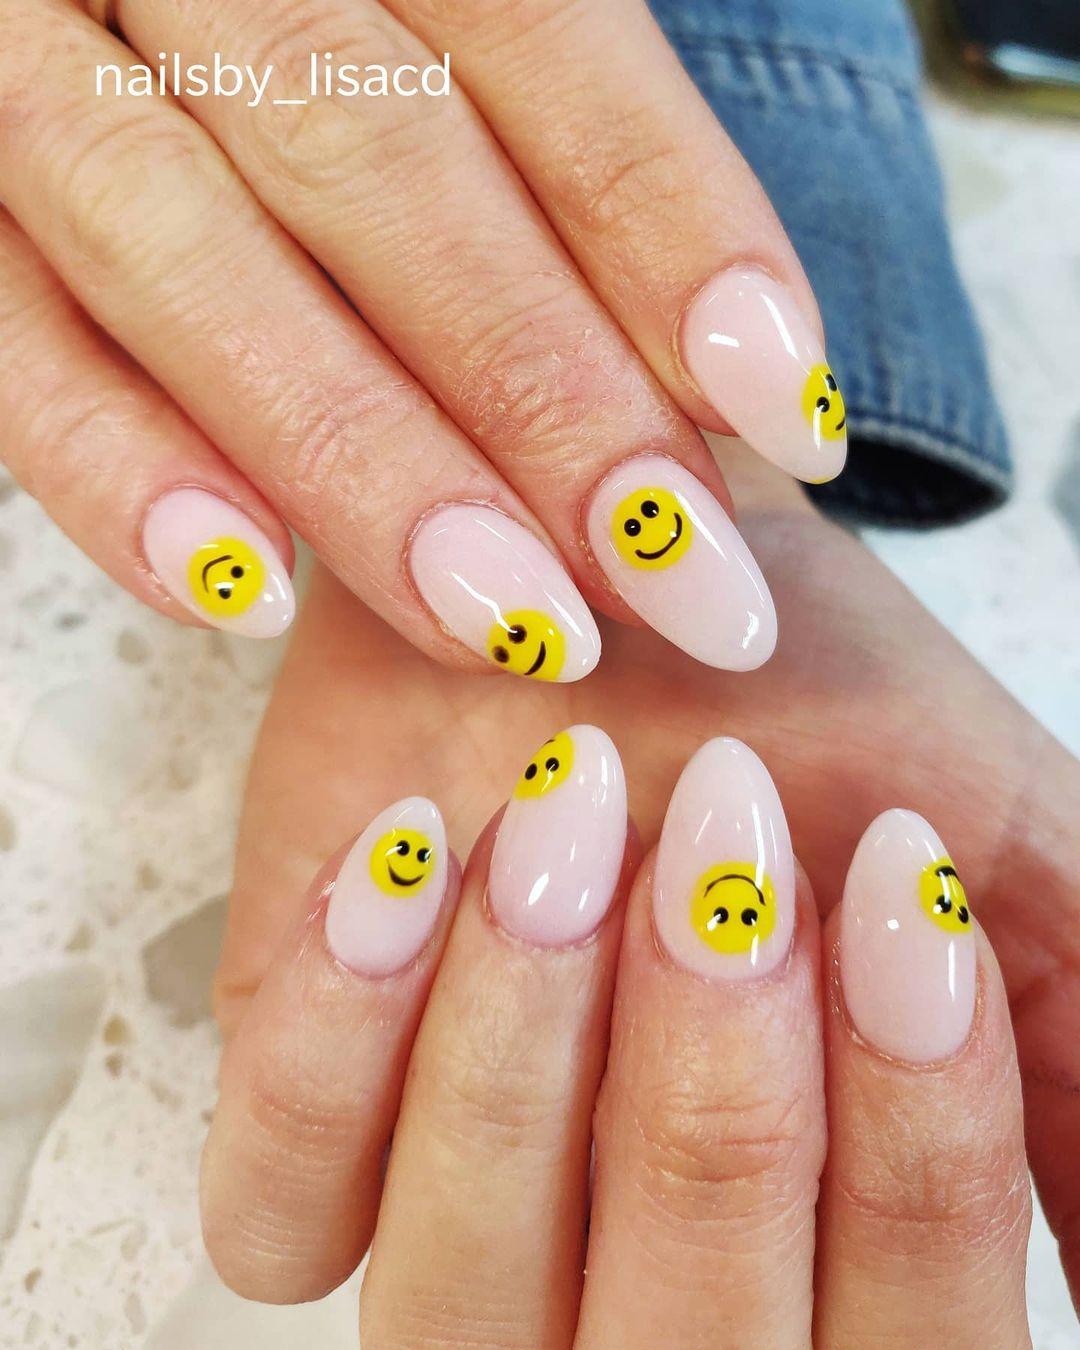 harry styles 4 nails